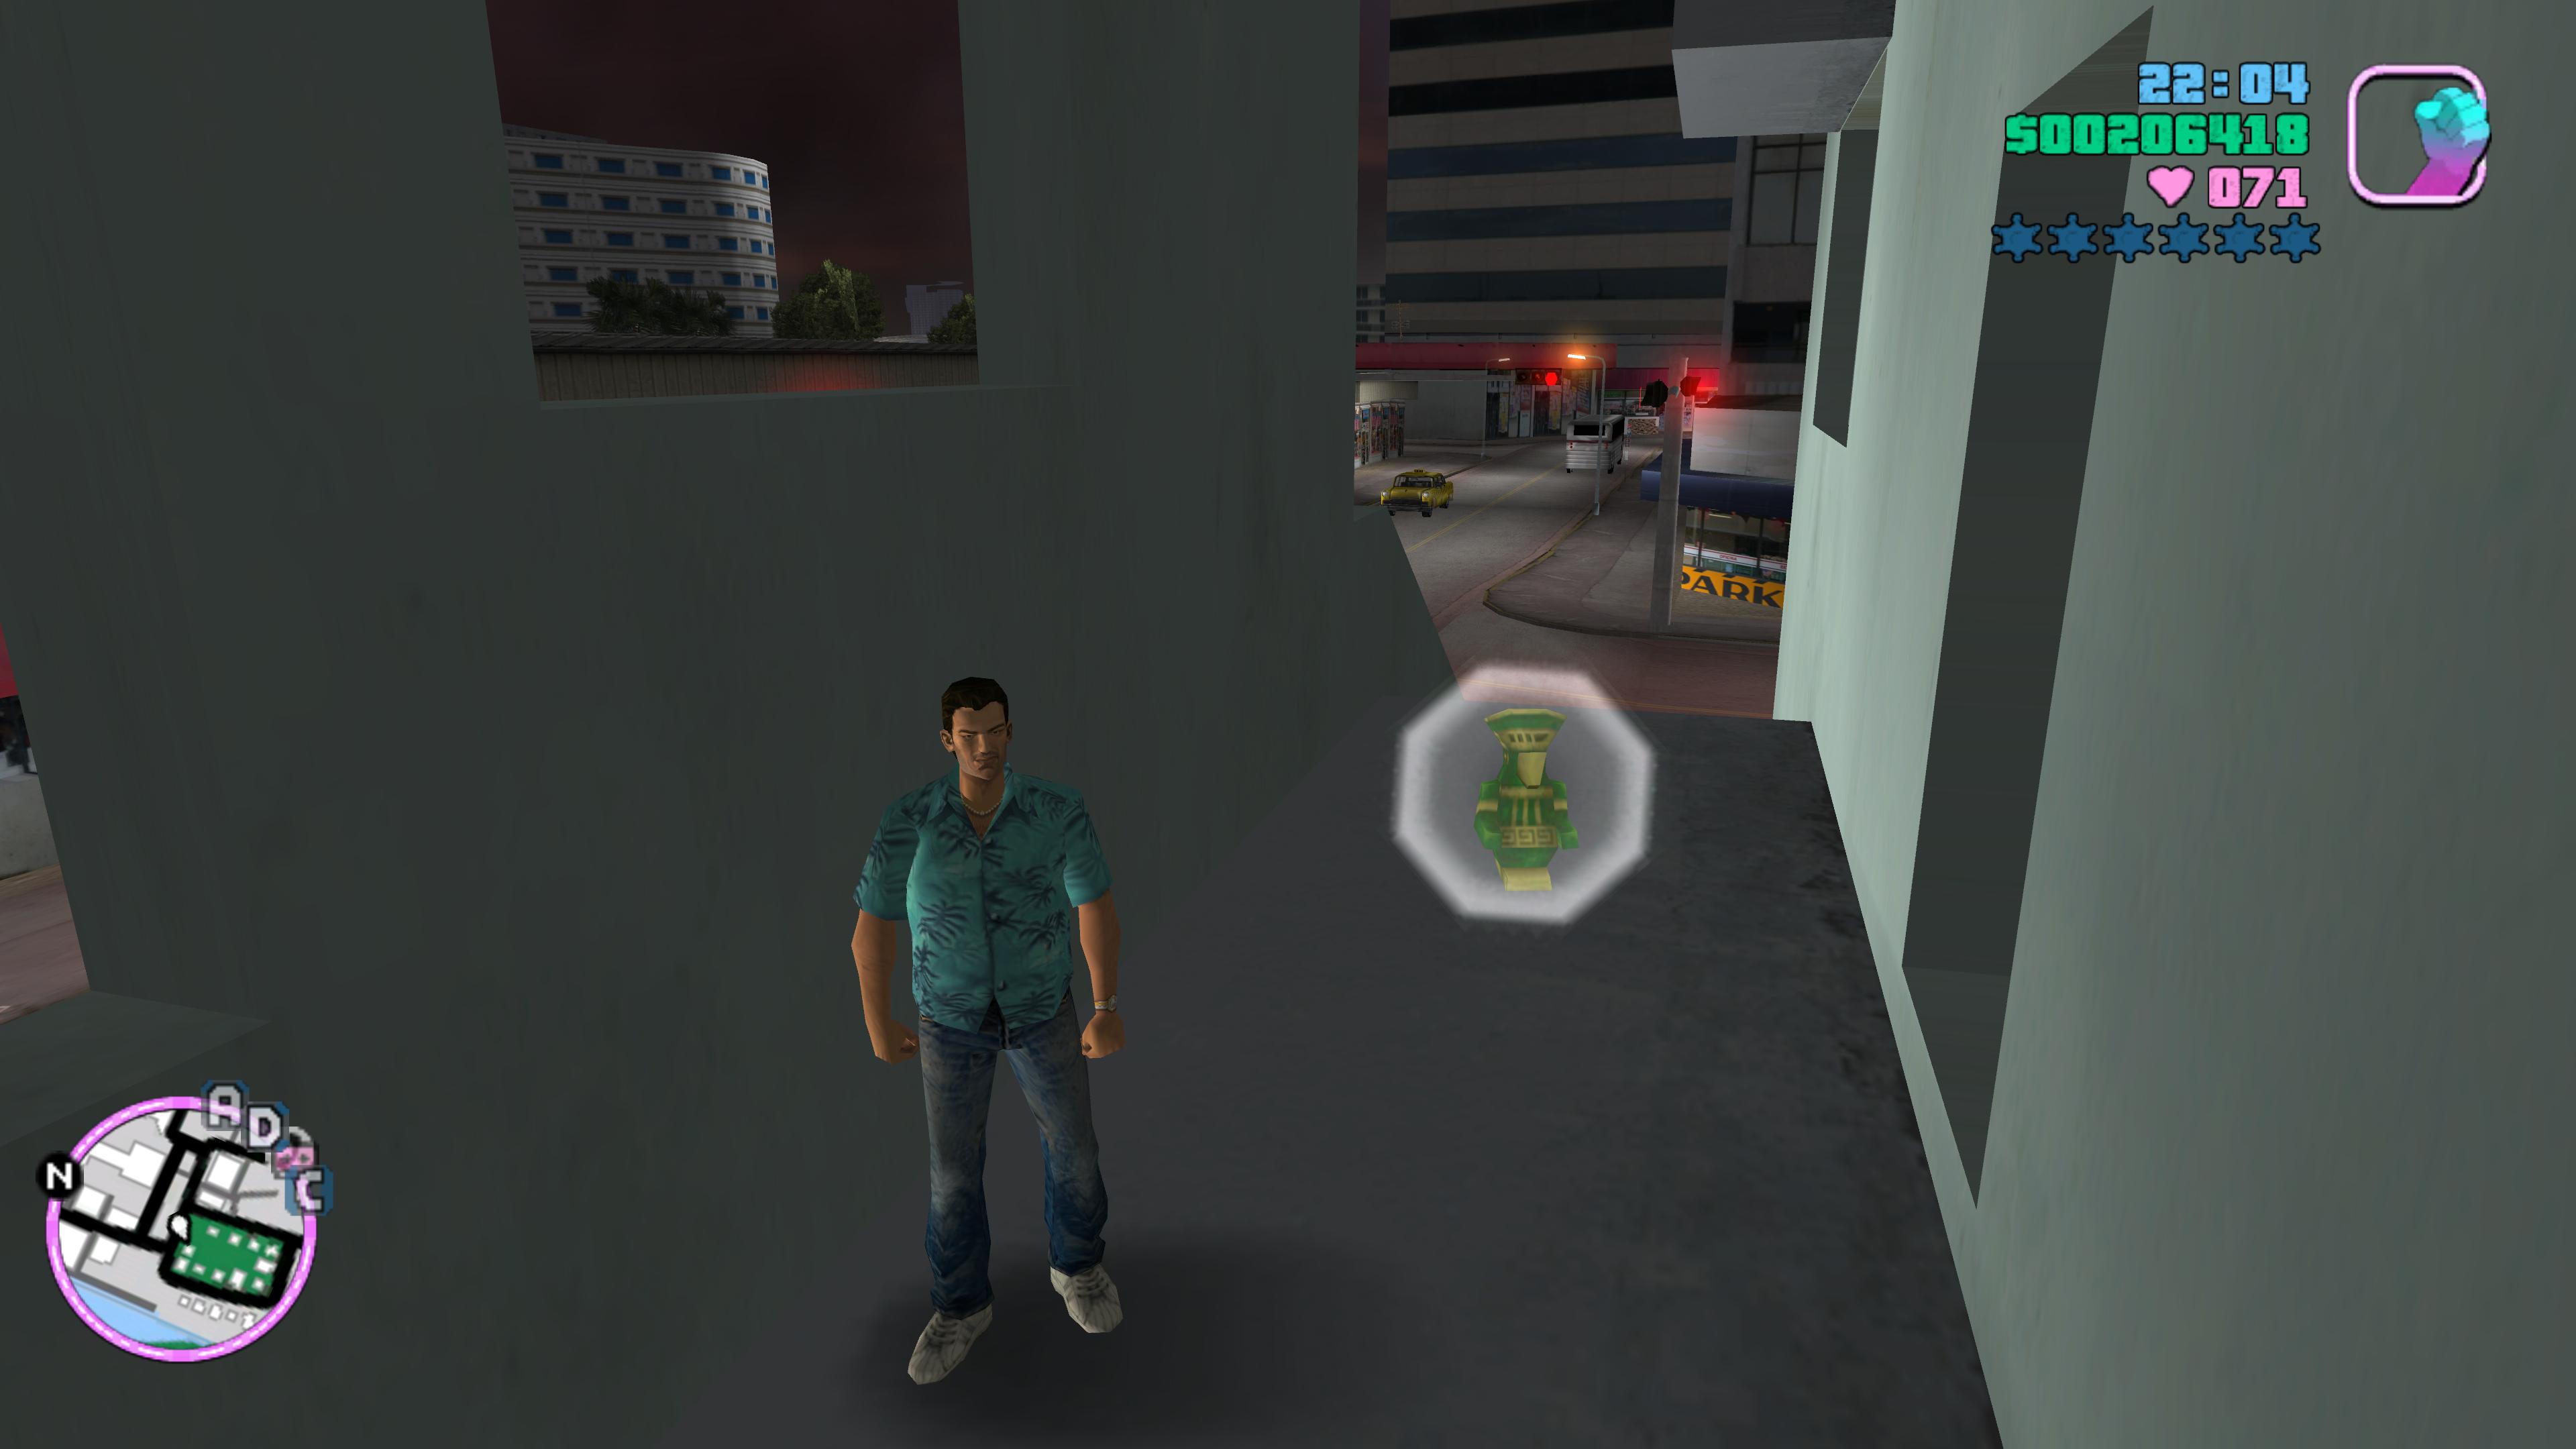 Archivo:GTA VC Objeto Oculto 73.PNG